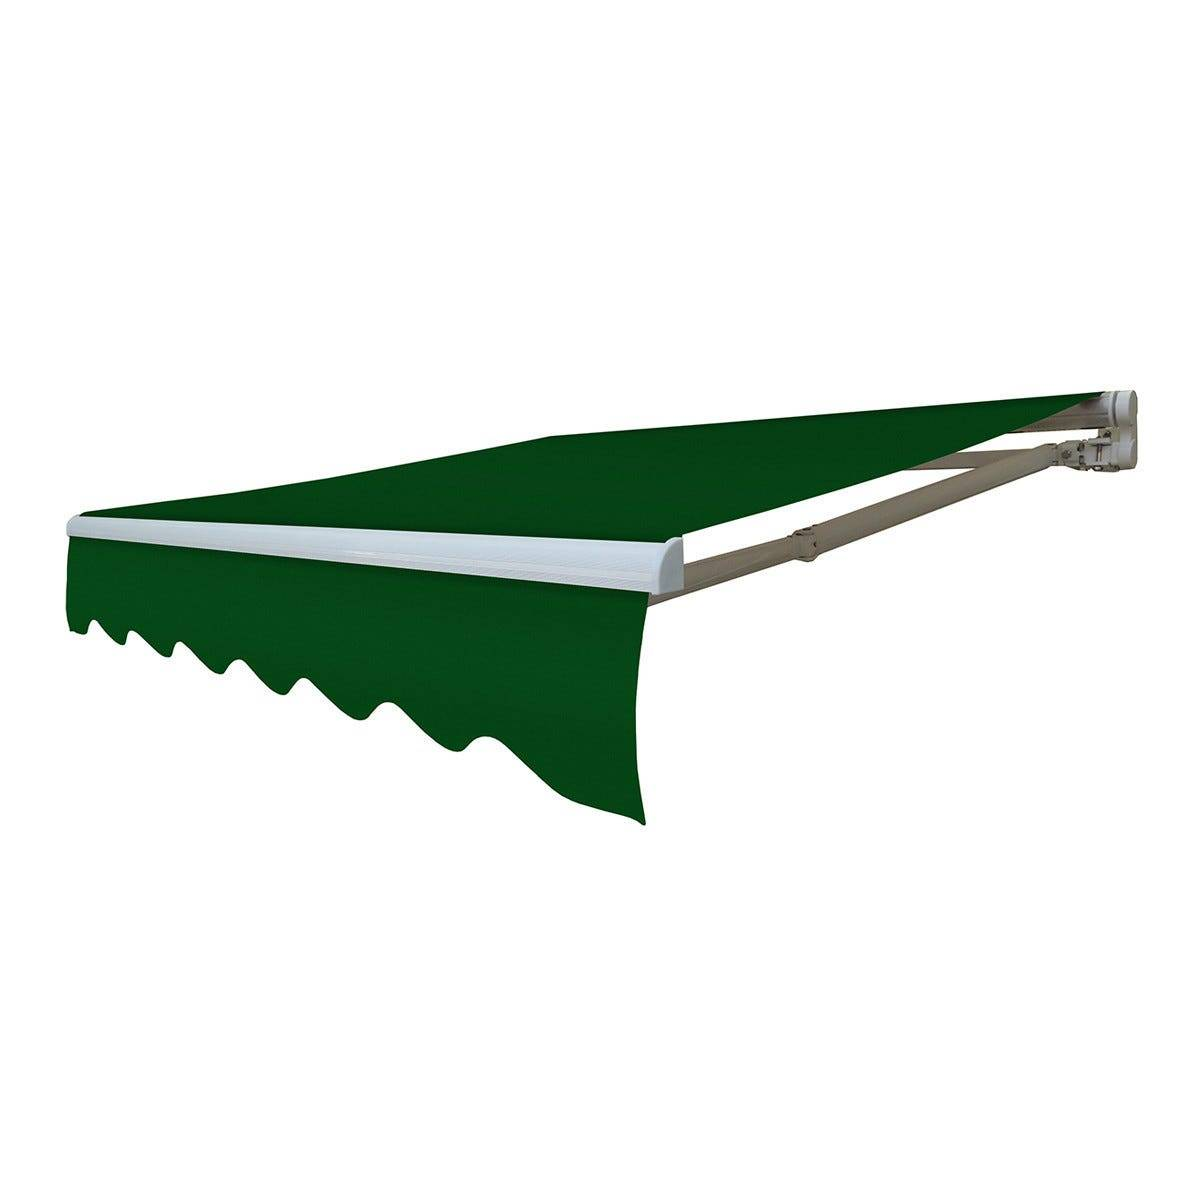 Tenda Da Sole A Barra Quadra Verde Tinta Unita 295x200 Cm (Lxp)